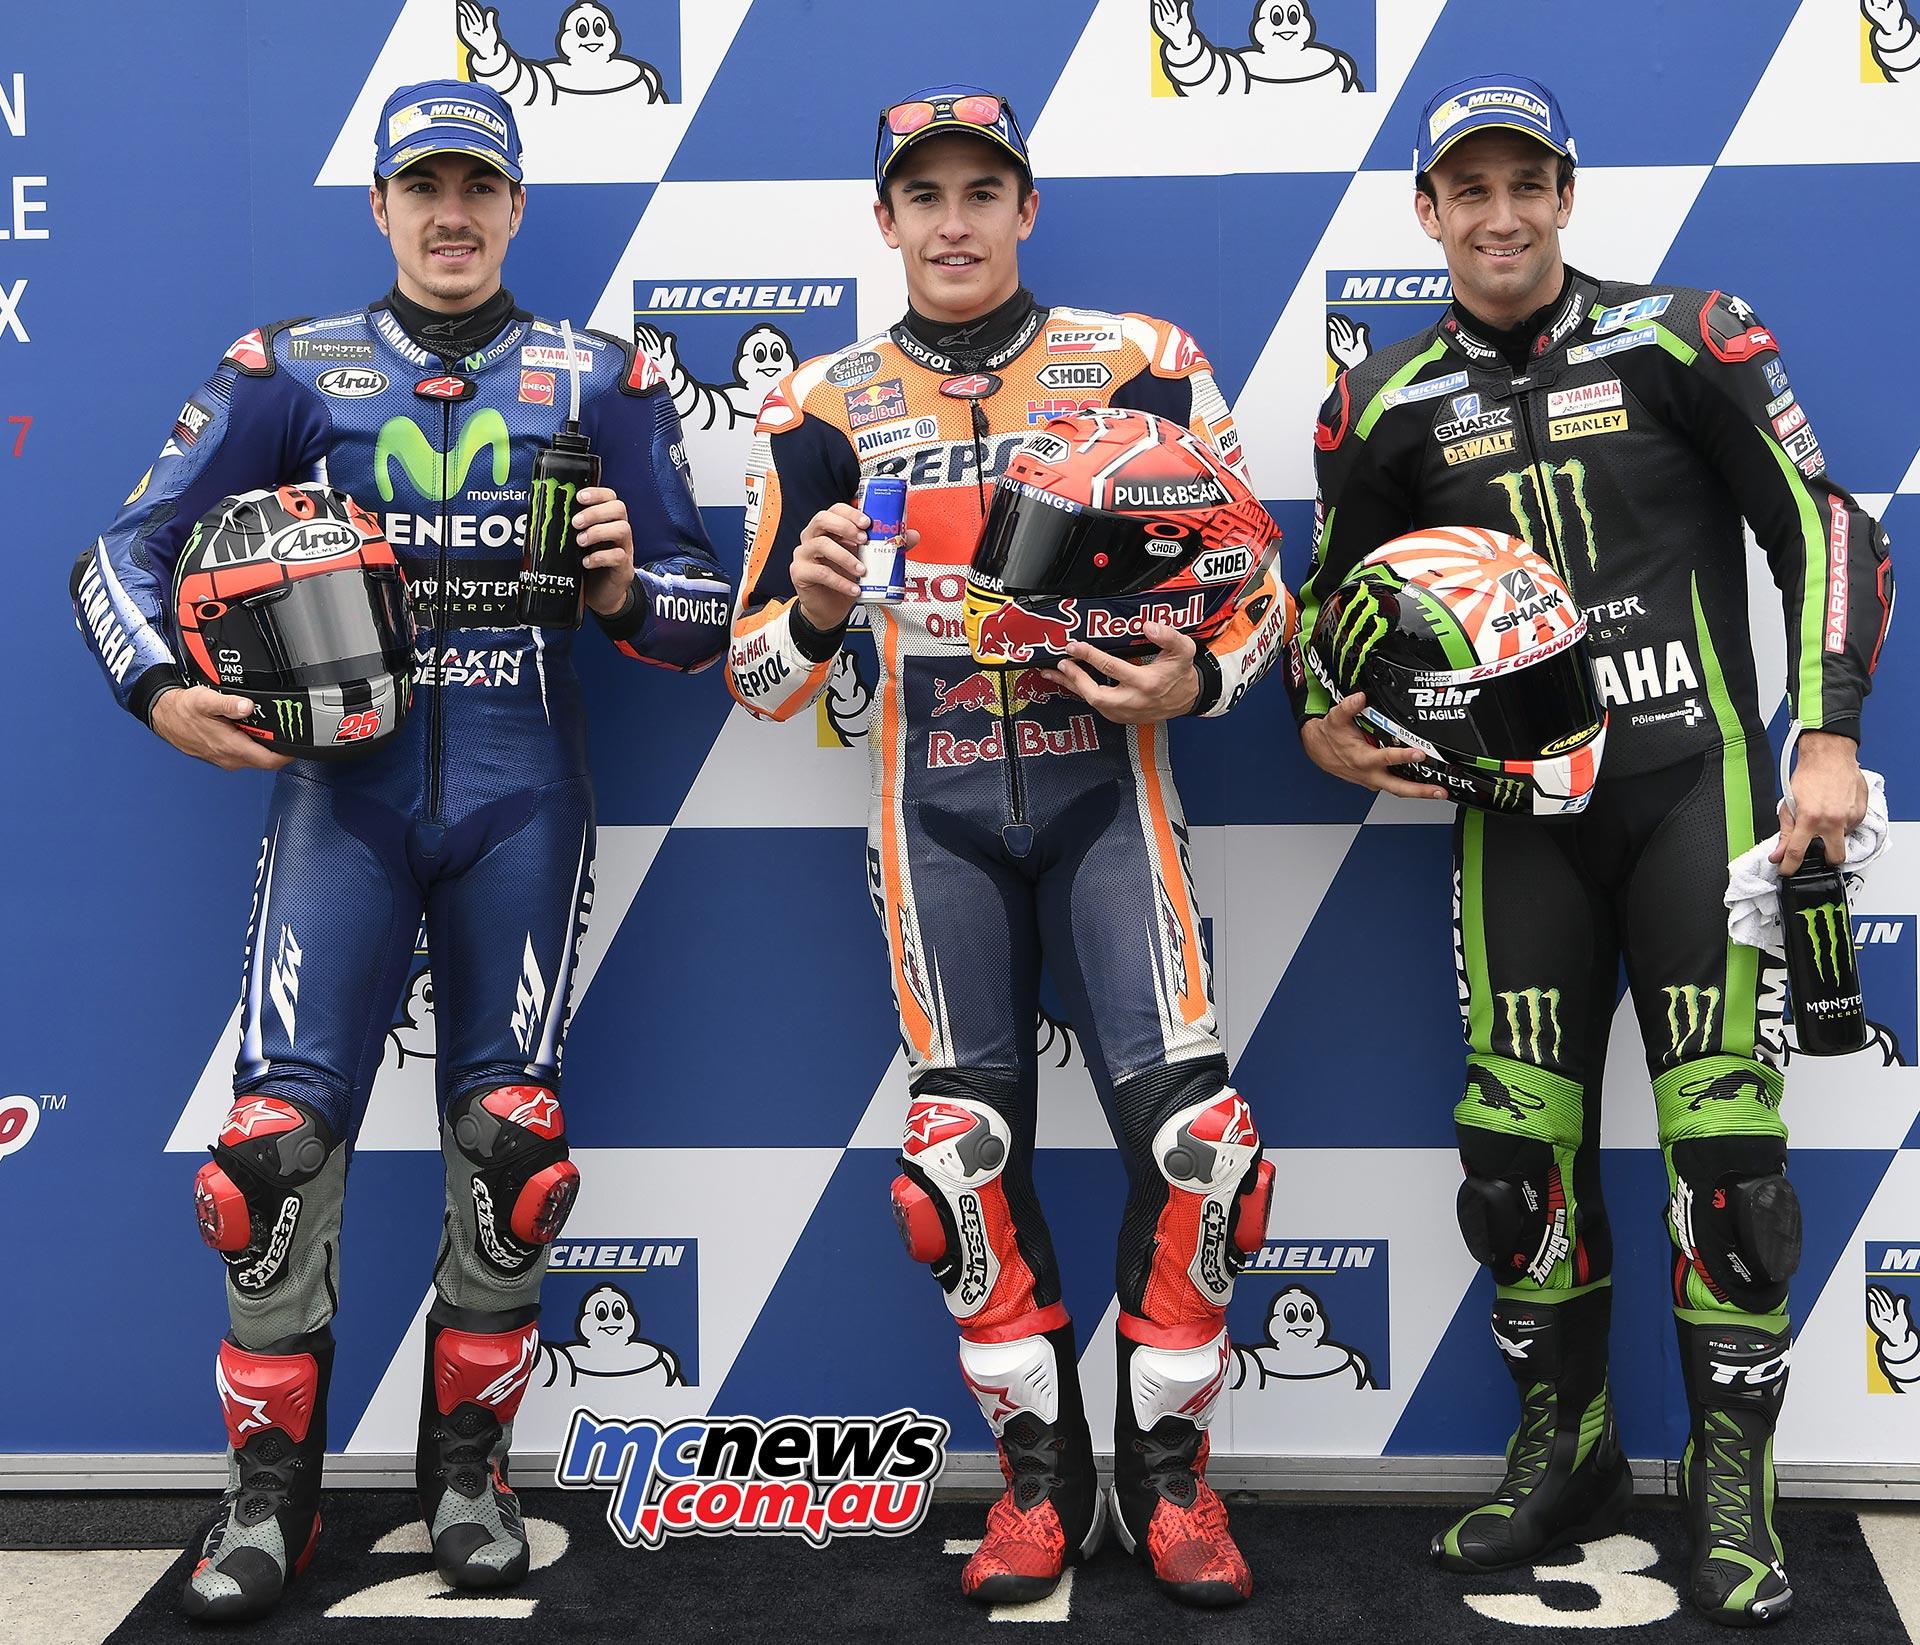 Qualifying Results MARQUEZMarc 93 SPA Repsol Honda Team 1'28.386 VINALESMaverick 25 SPA Movistar Yamaha MotoGP 0.333 ZARCOJohann 5 FRA Monster Yamaha Tech 3 0.358